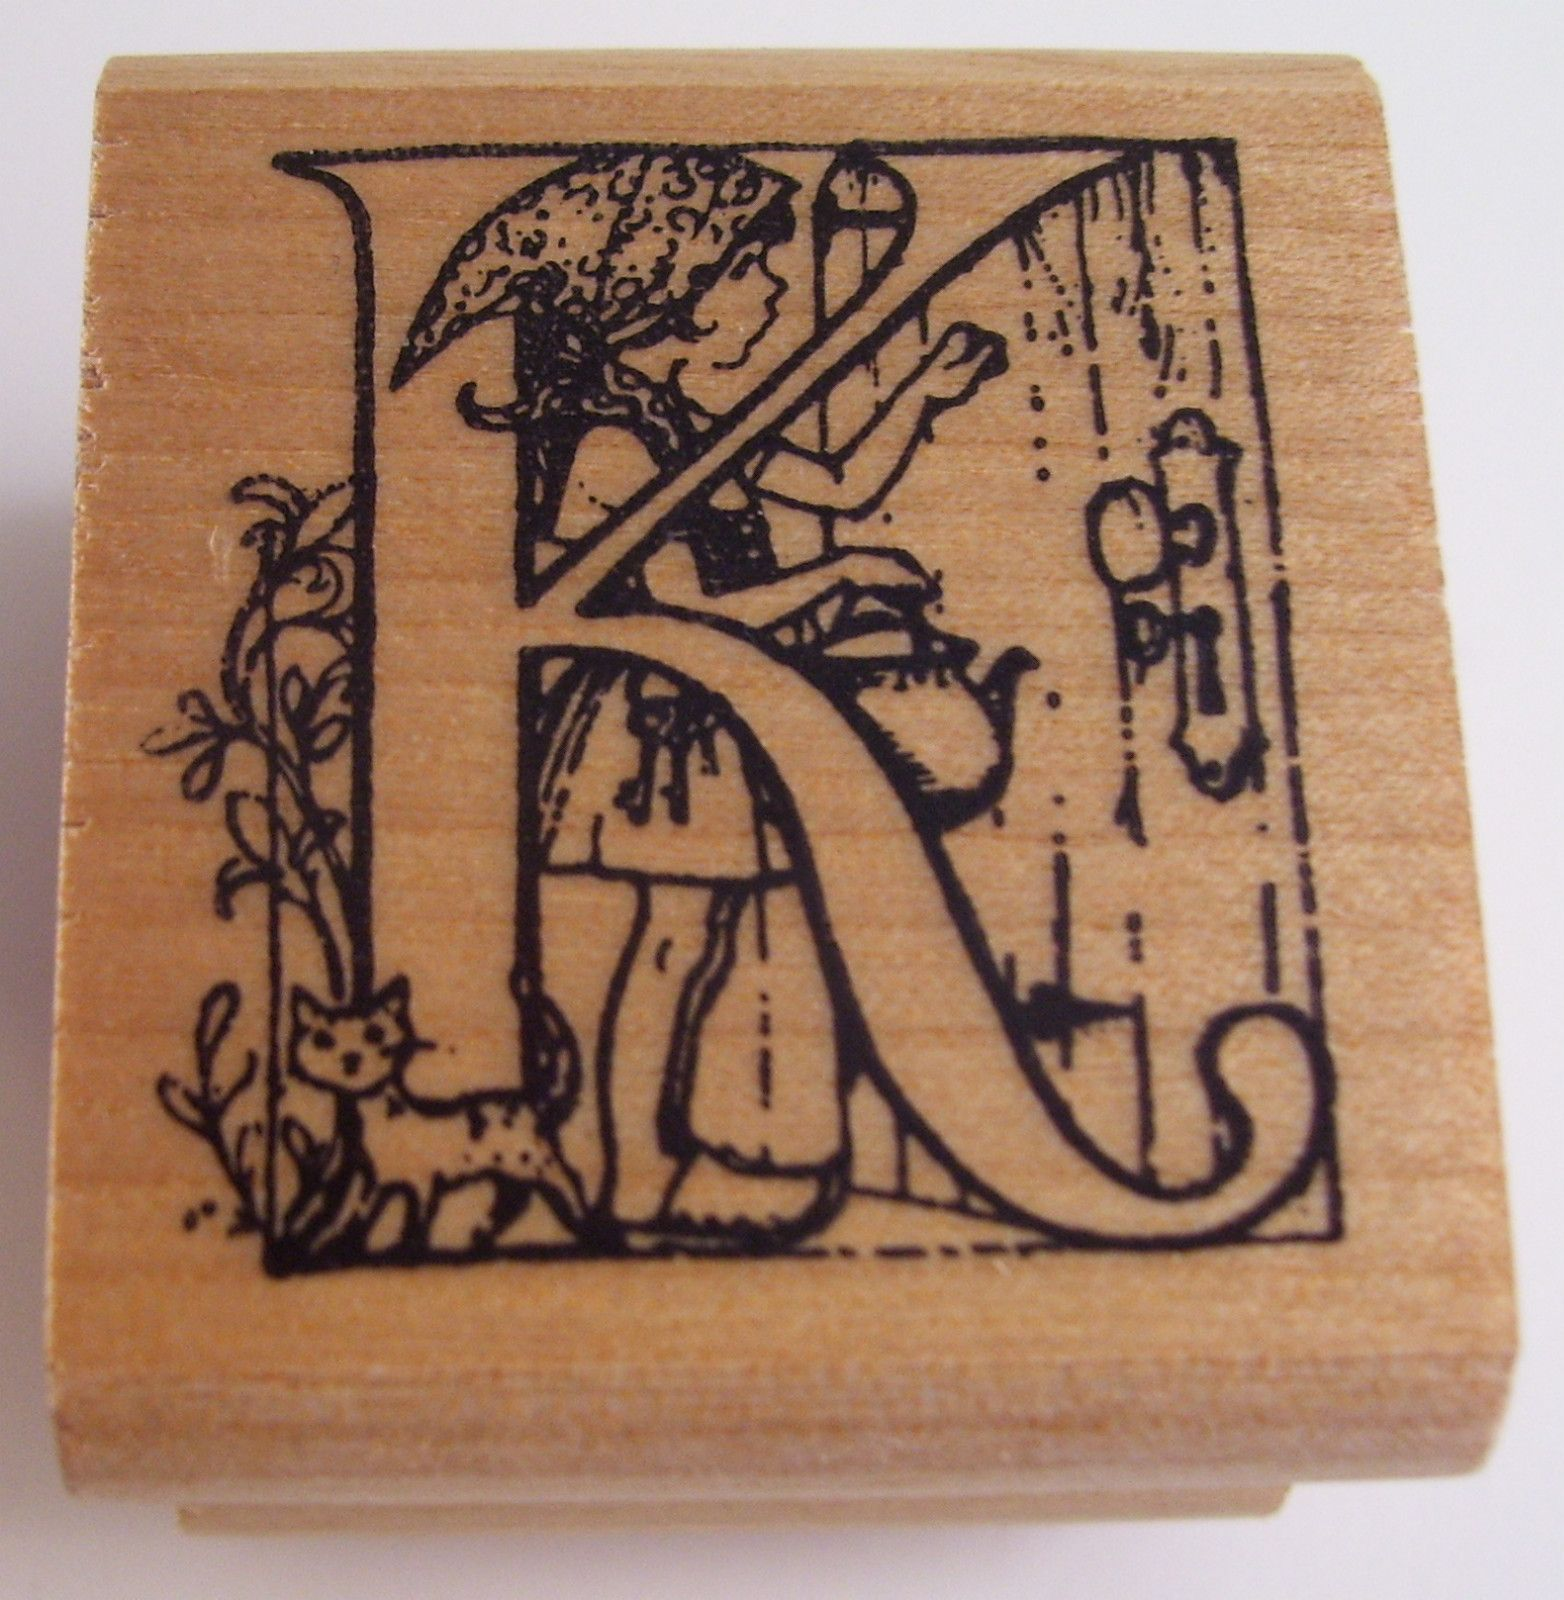 Trina Schart Hyman Alphabet Letter K Kidstamps Rubber Stamp